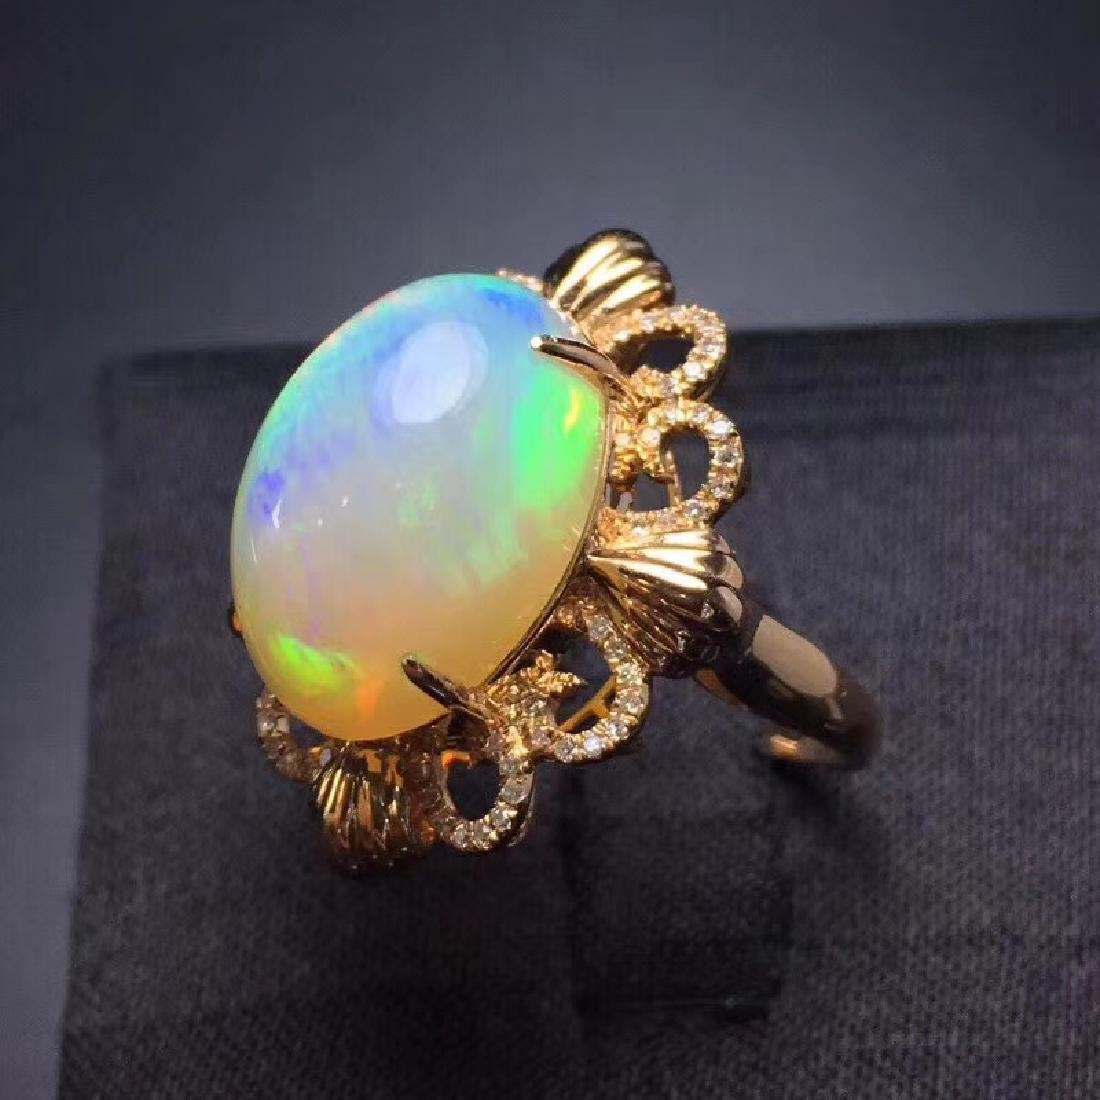 7.7 CTW Opal & VS Diamond Ring 18K - 3